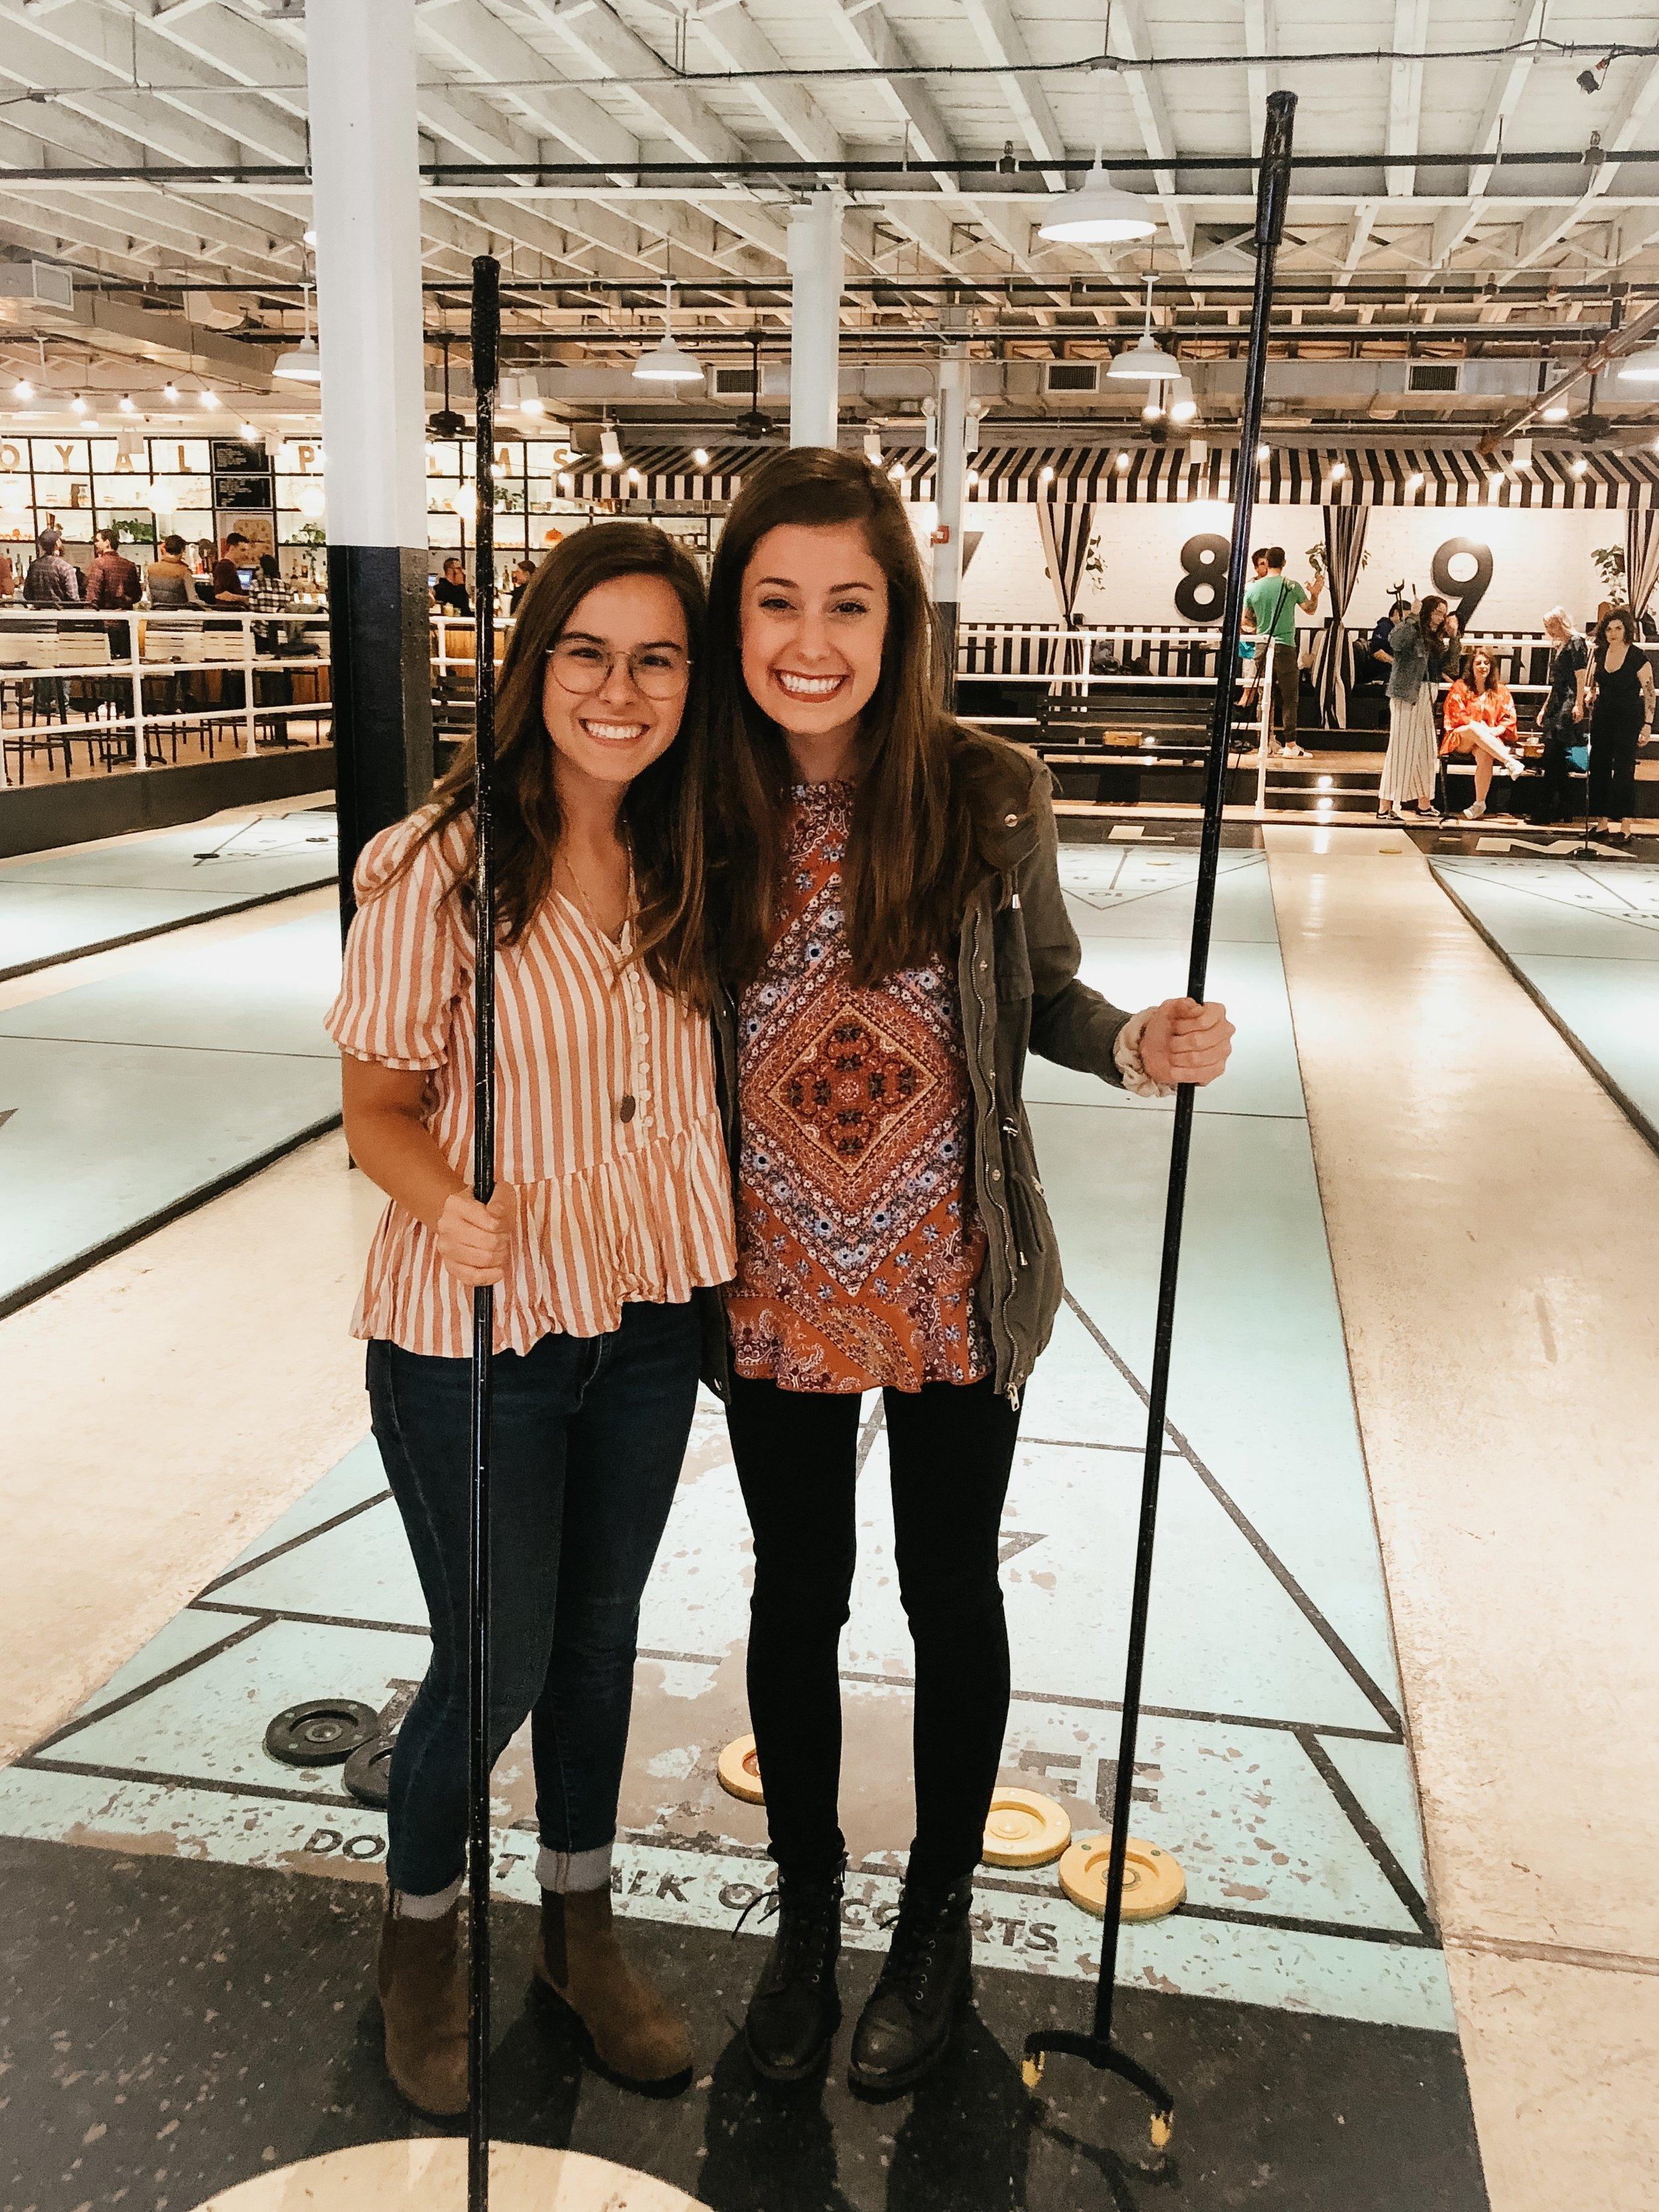 Image taken by RPSC employee of Samantha McHenry and Sara Kreski, Royal Palm Shuffleboard Club 2019.